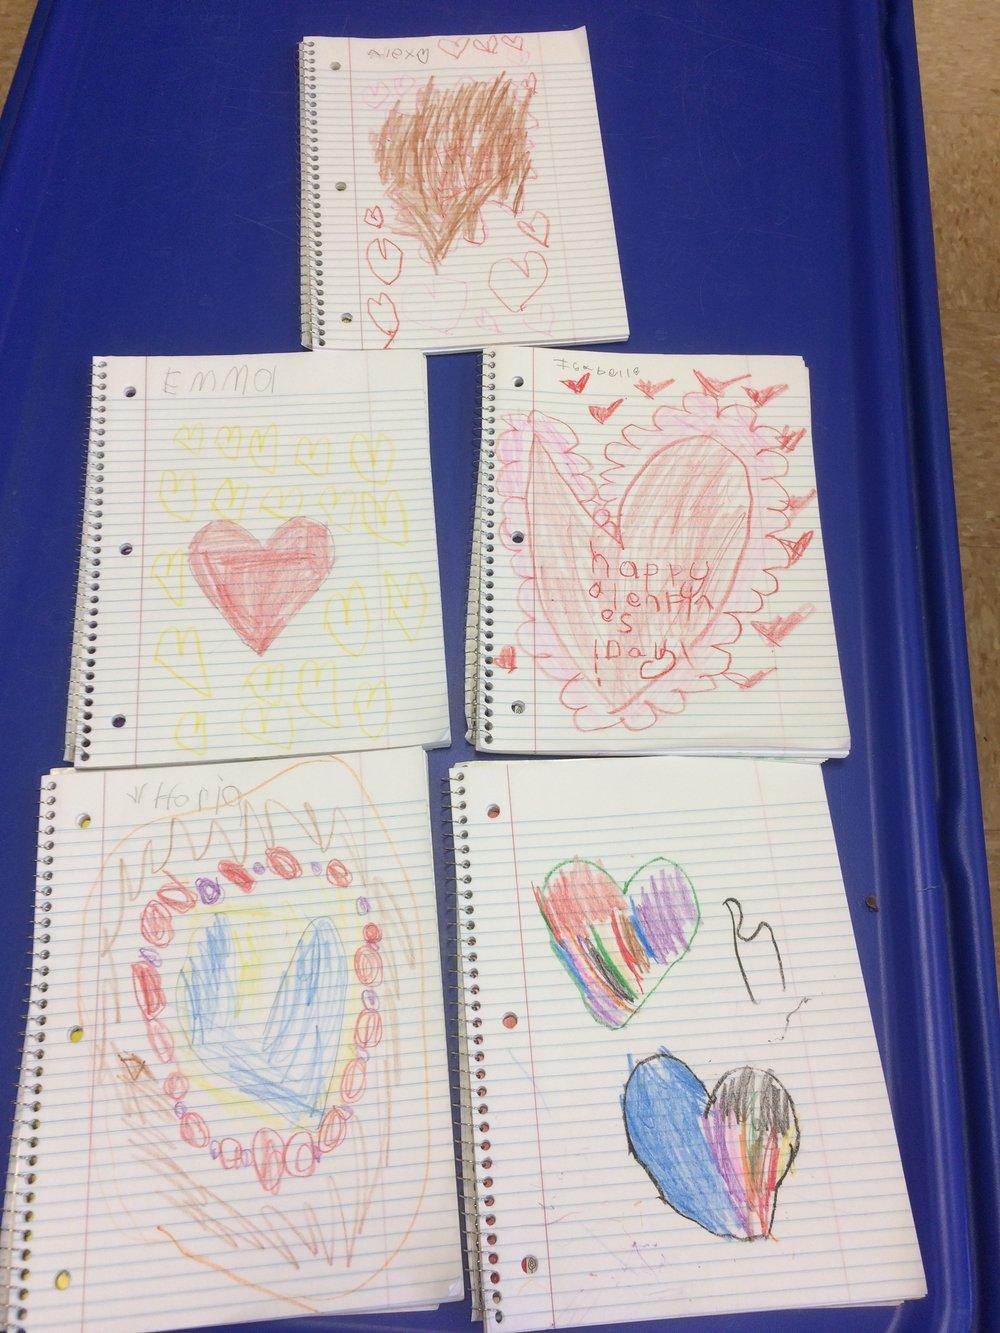 Friends added a valentine message to their journals! XOXO